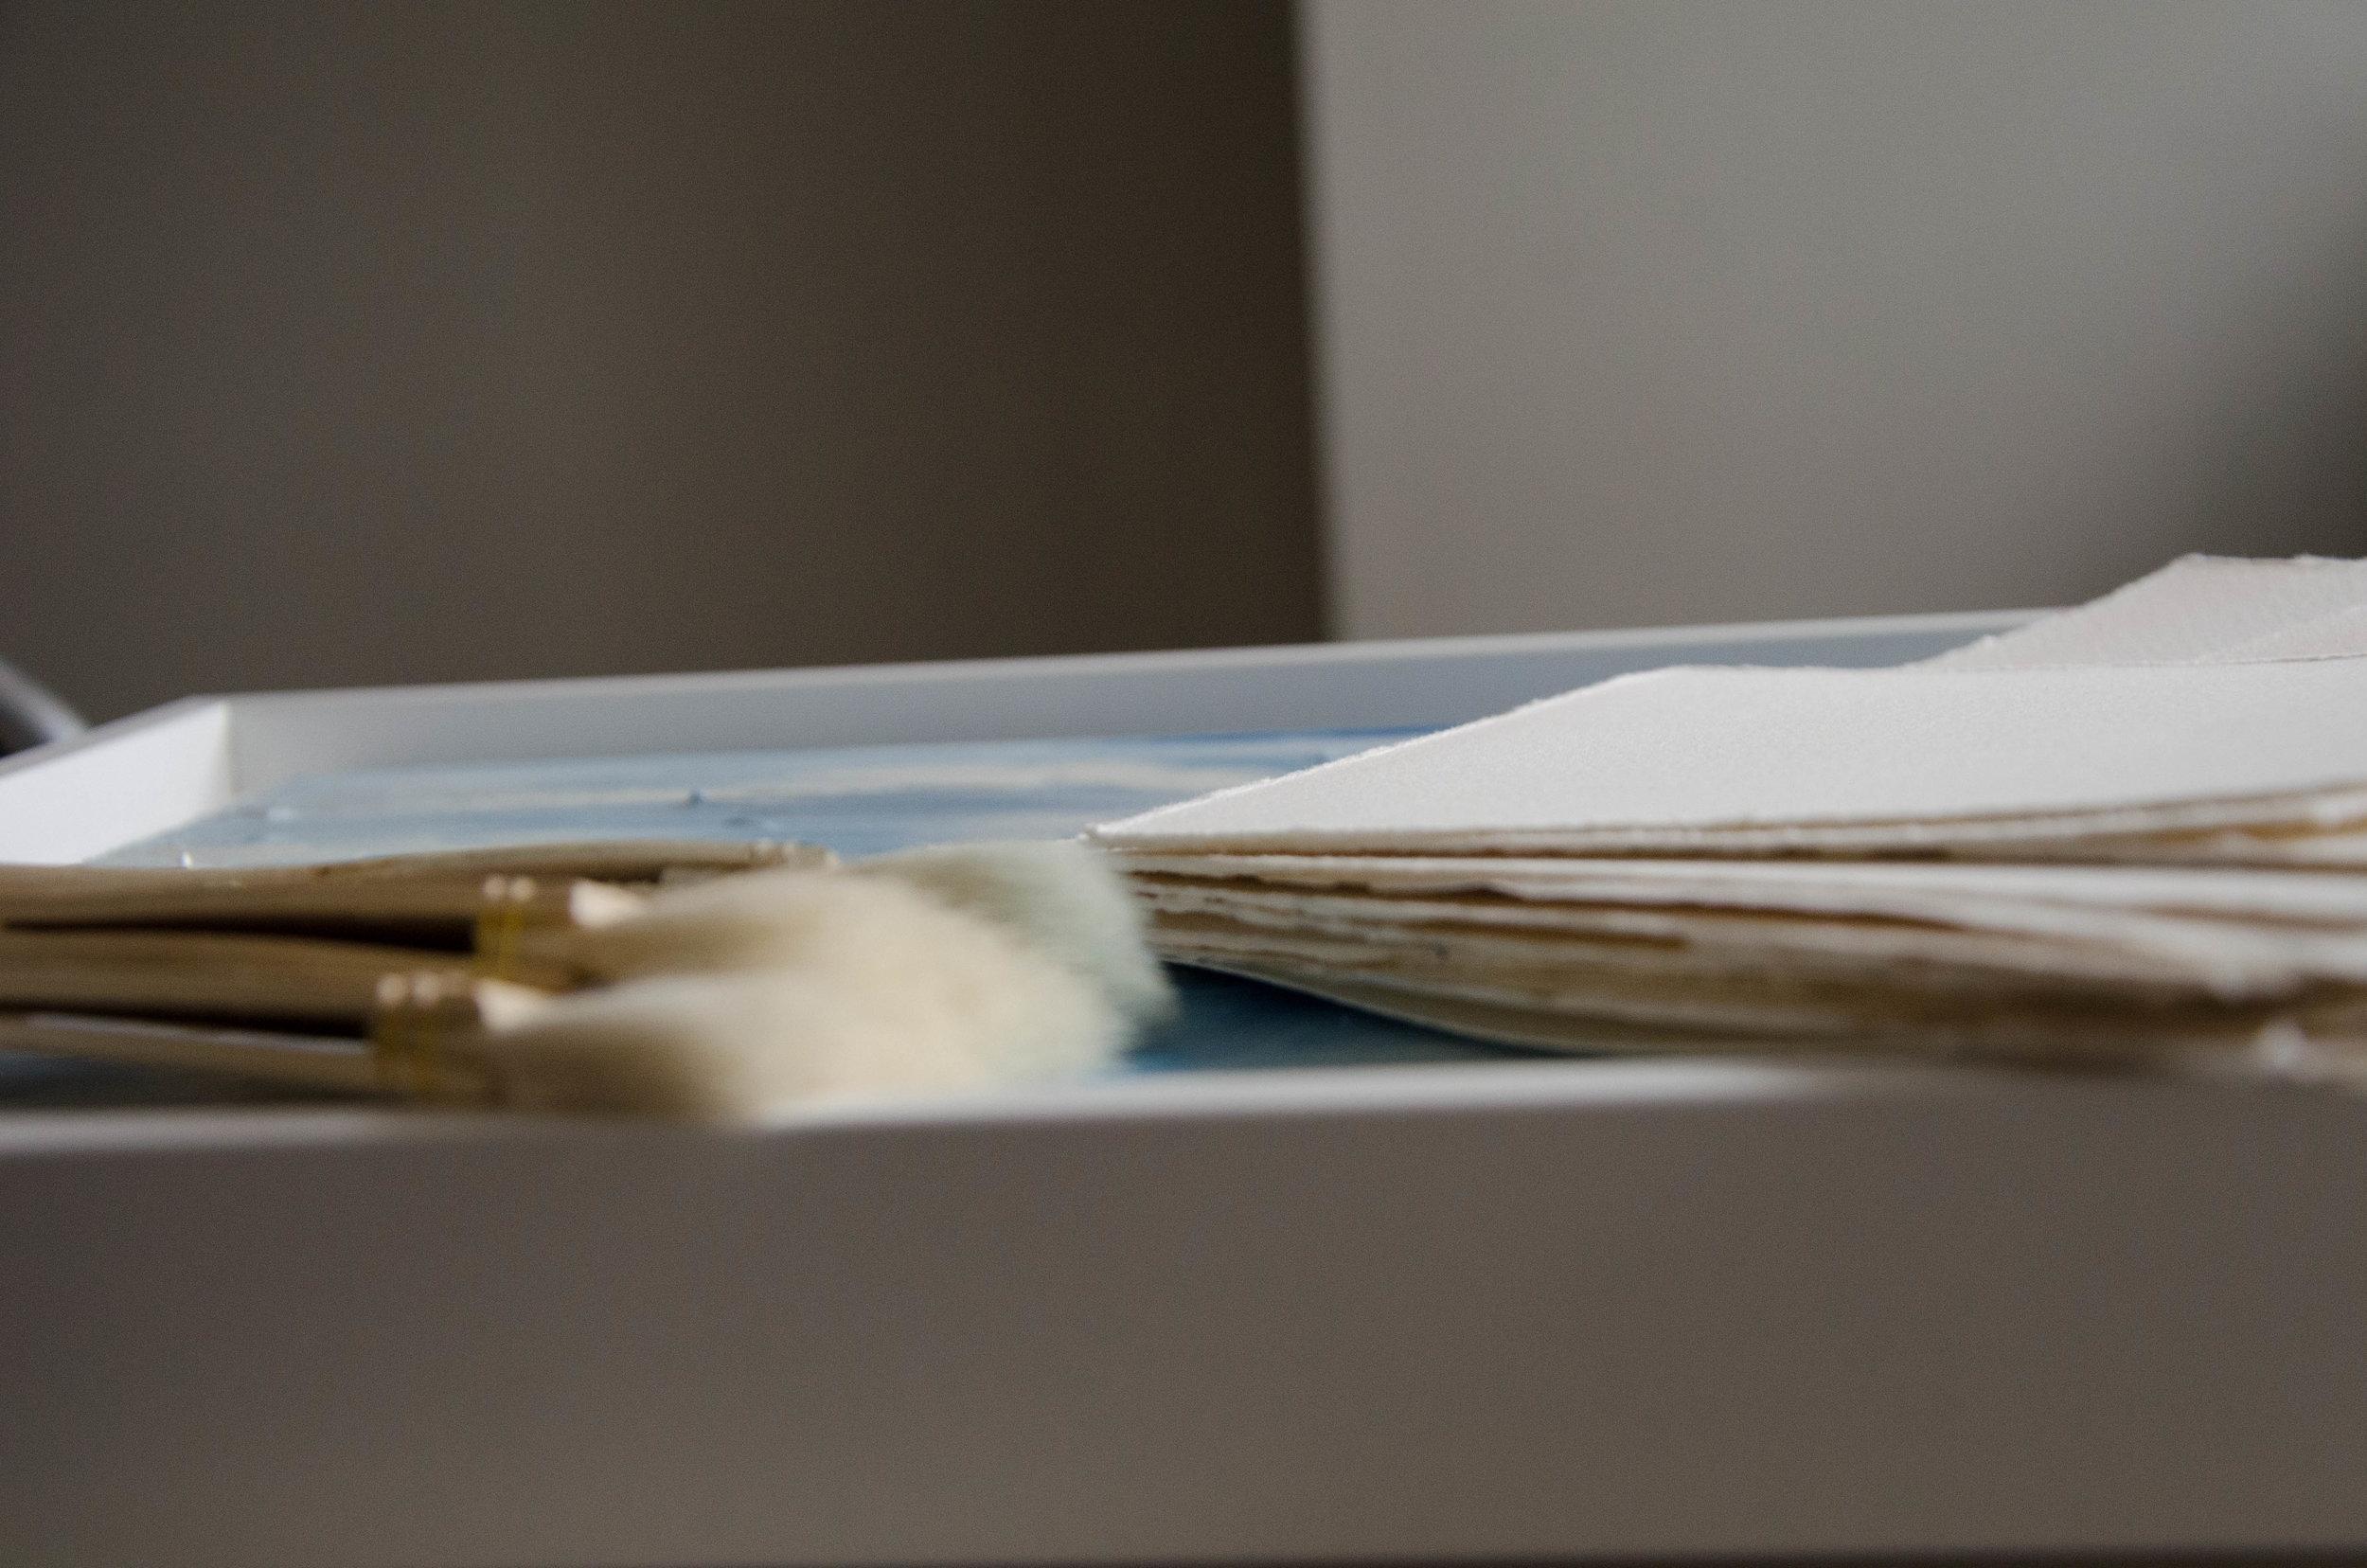 marysia-champ-art-studio-process-supplies-paint-brushes-canvas